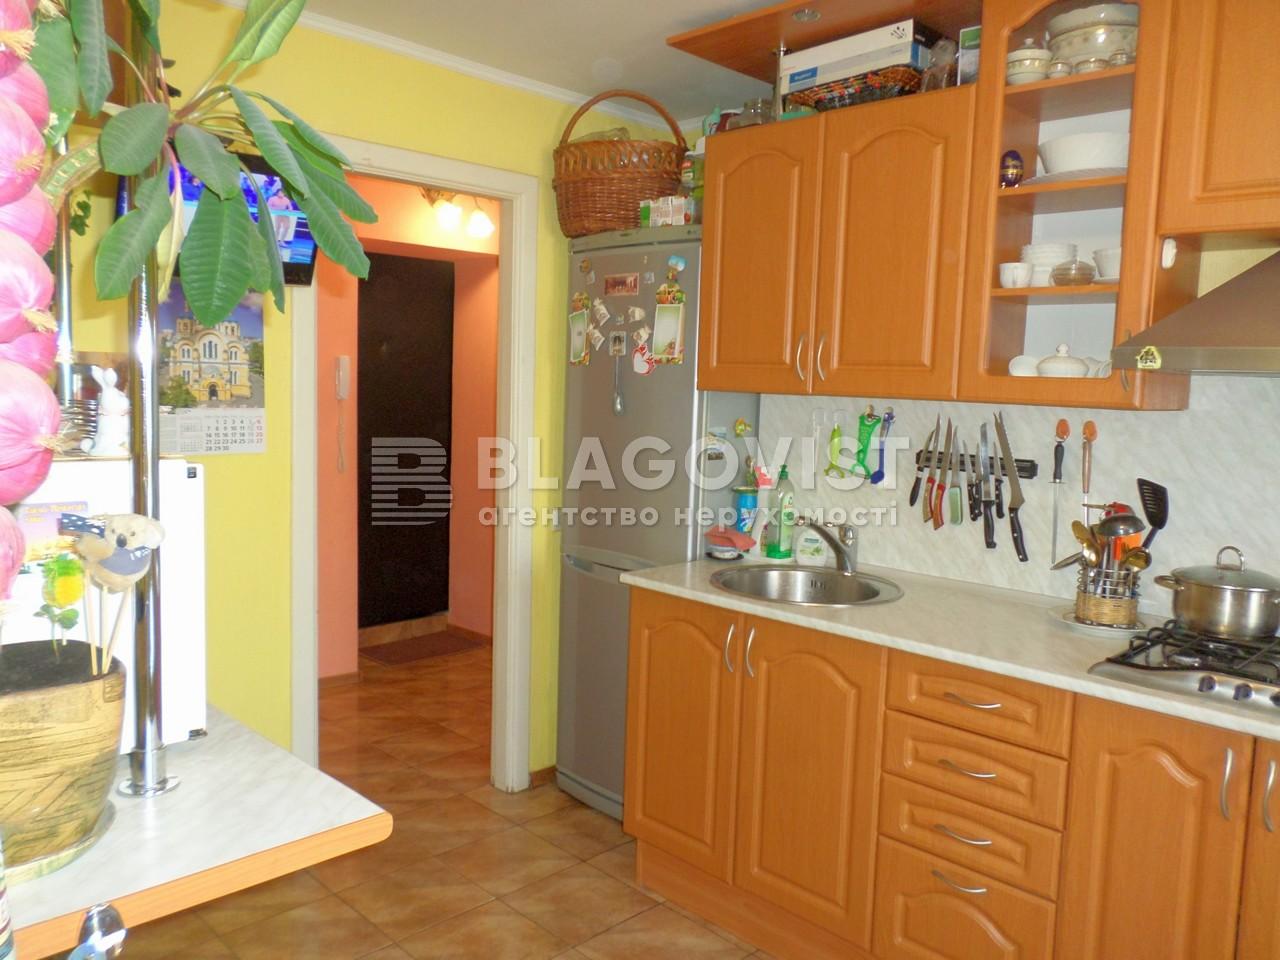 Квартира F-34331, Нововокзальная, 21, Киев - Фото 11